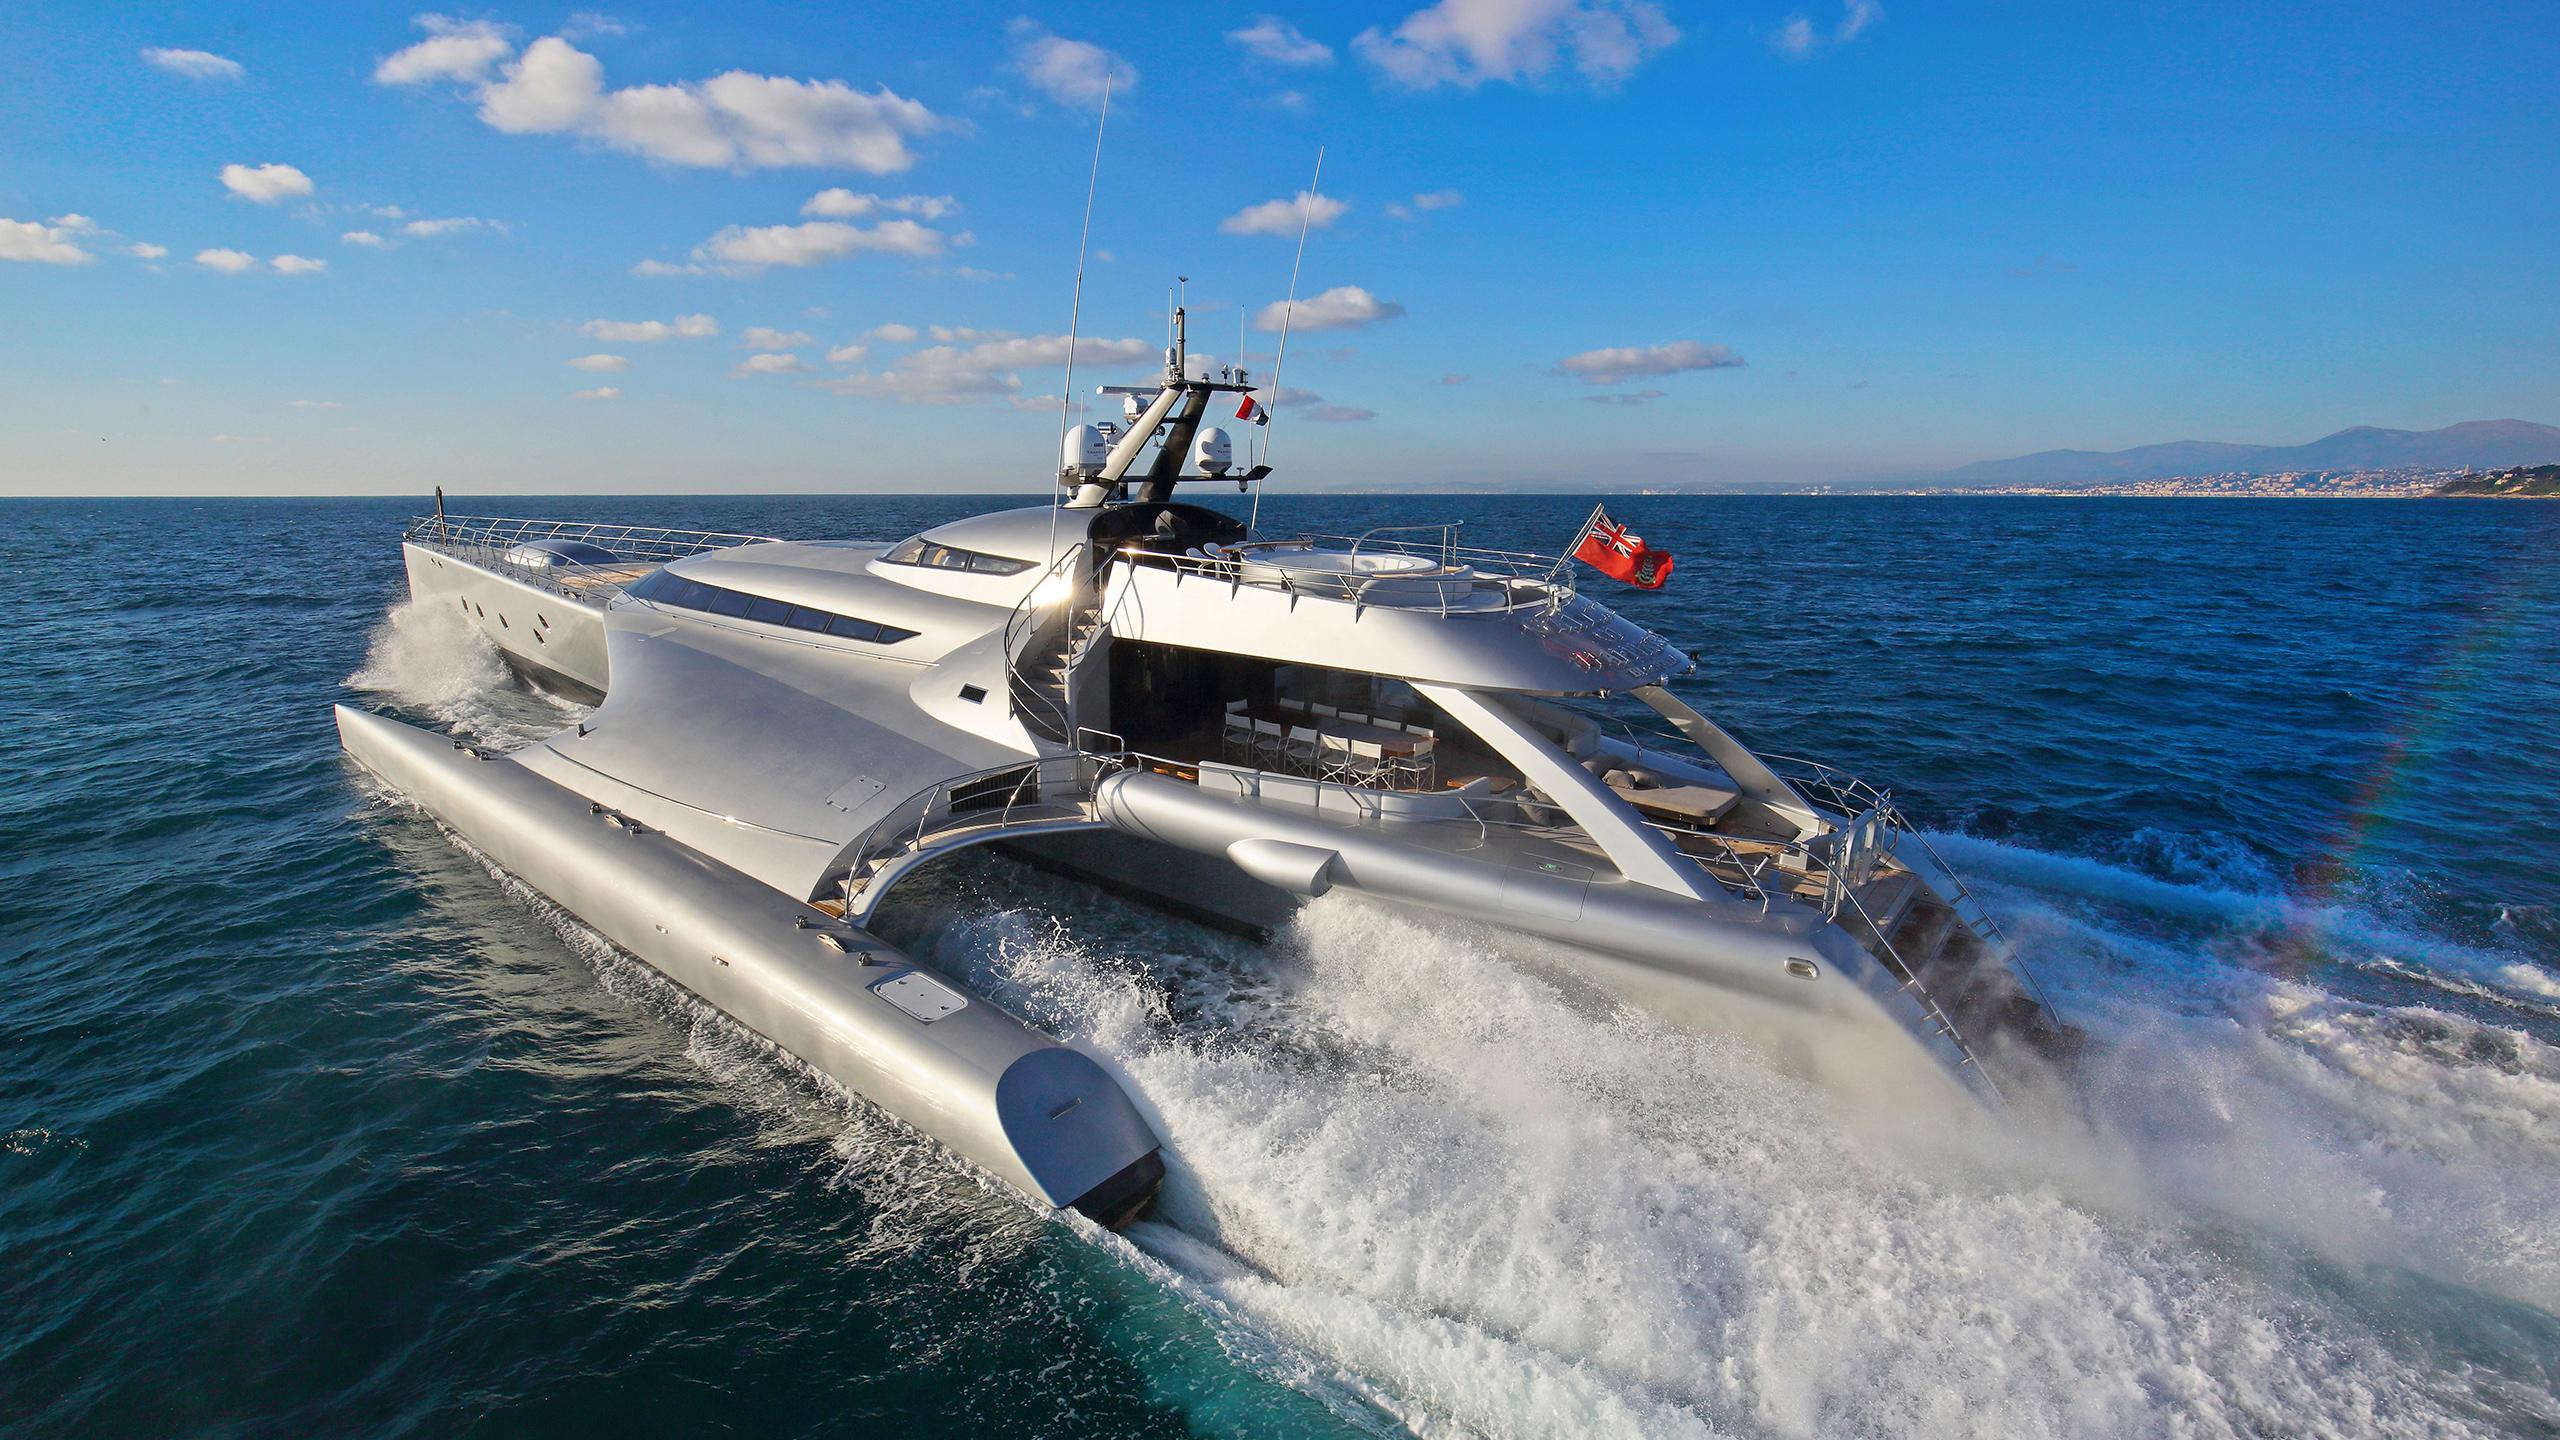 galaxy of happiness trimaran yacht latitude 2016 53m cruising half stern